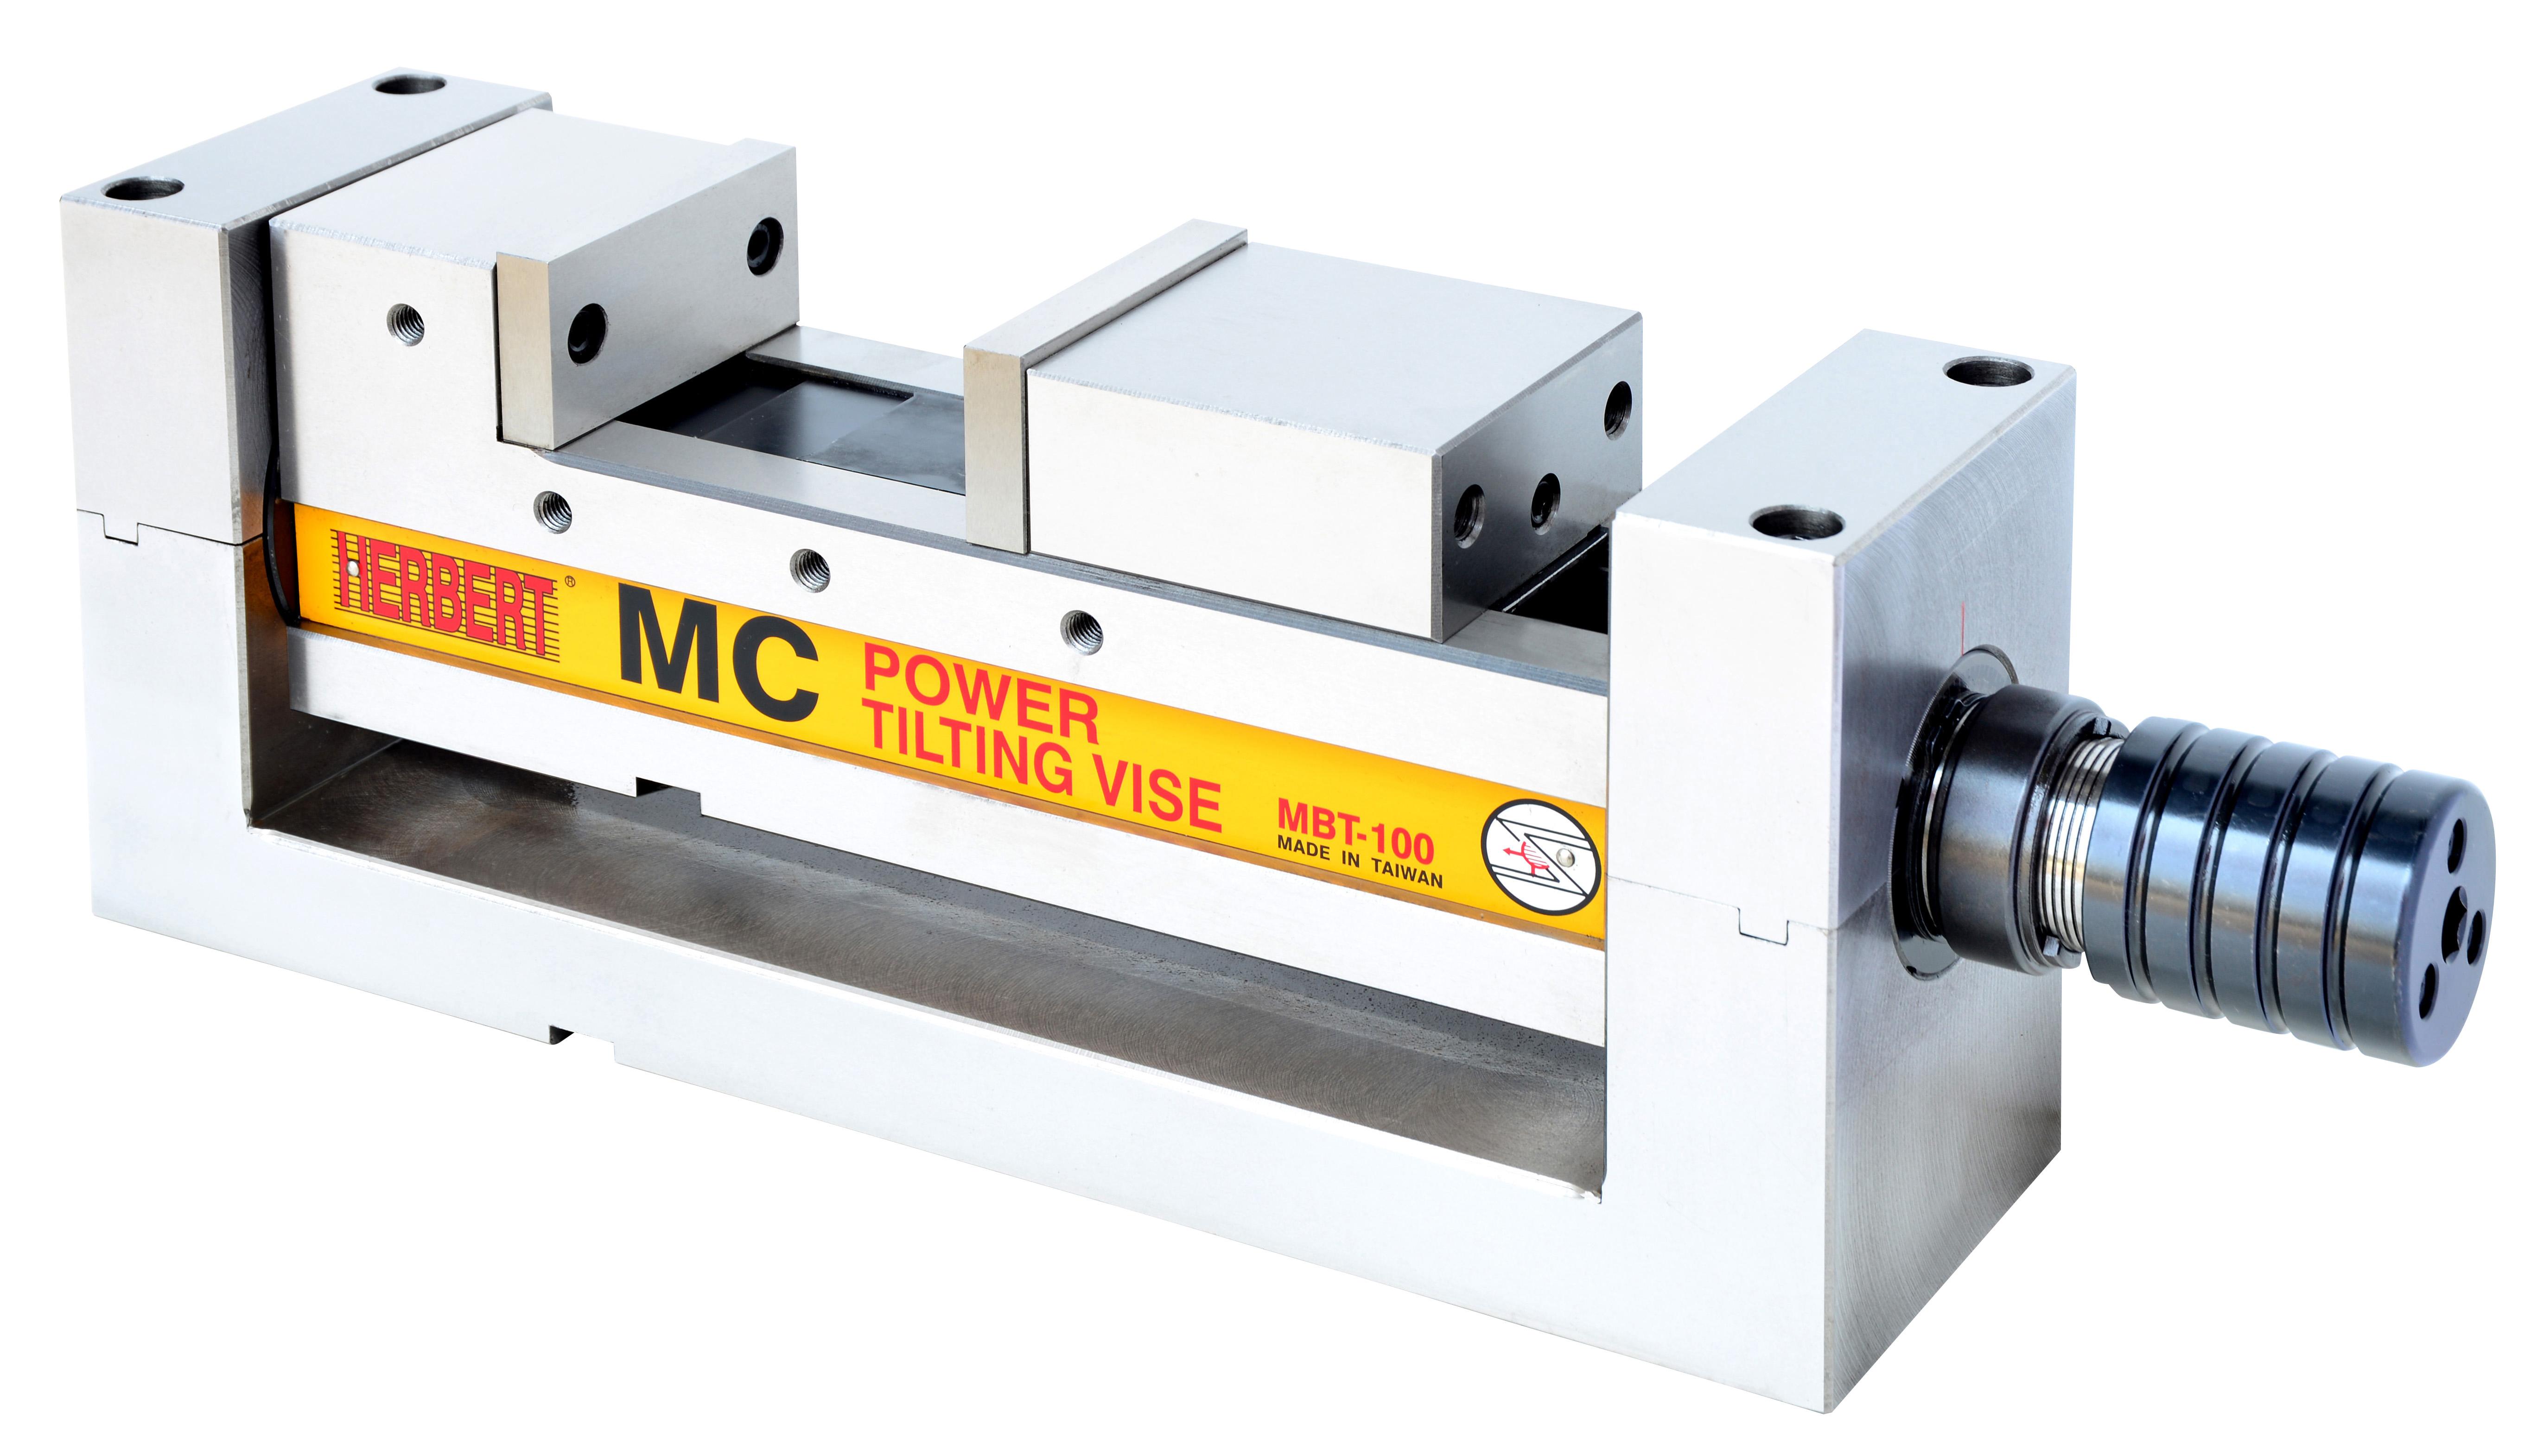 MC Universal Power Tilting Vise